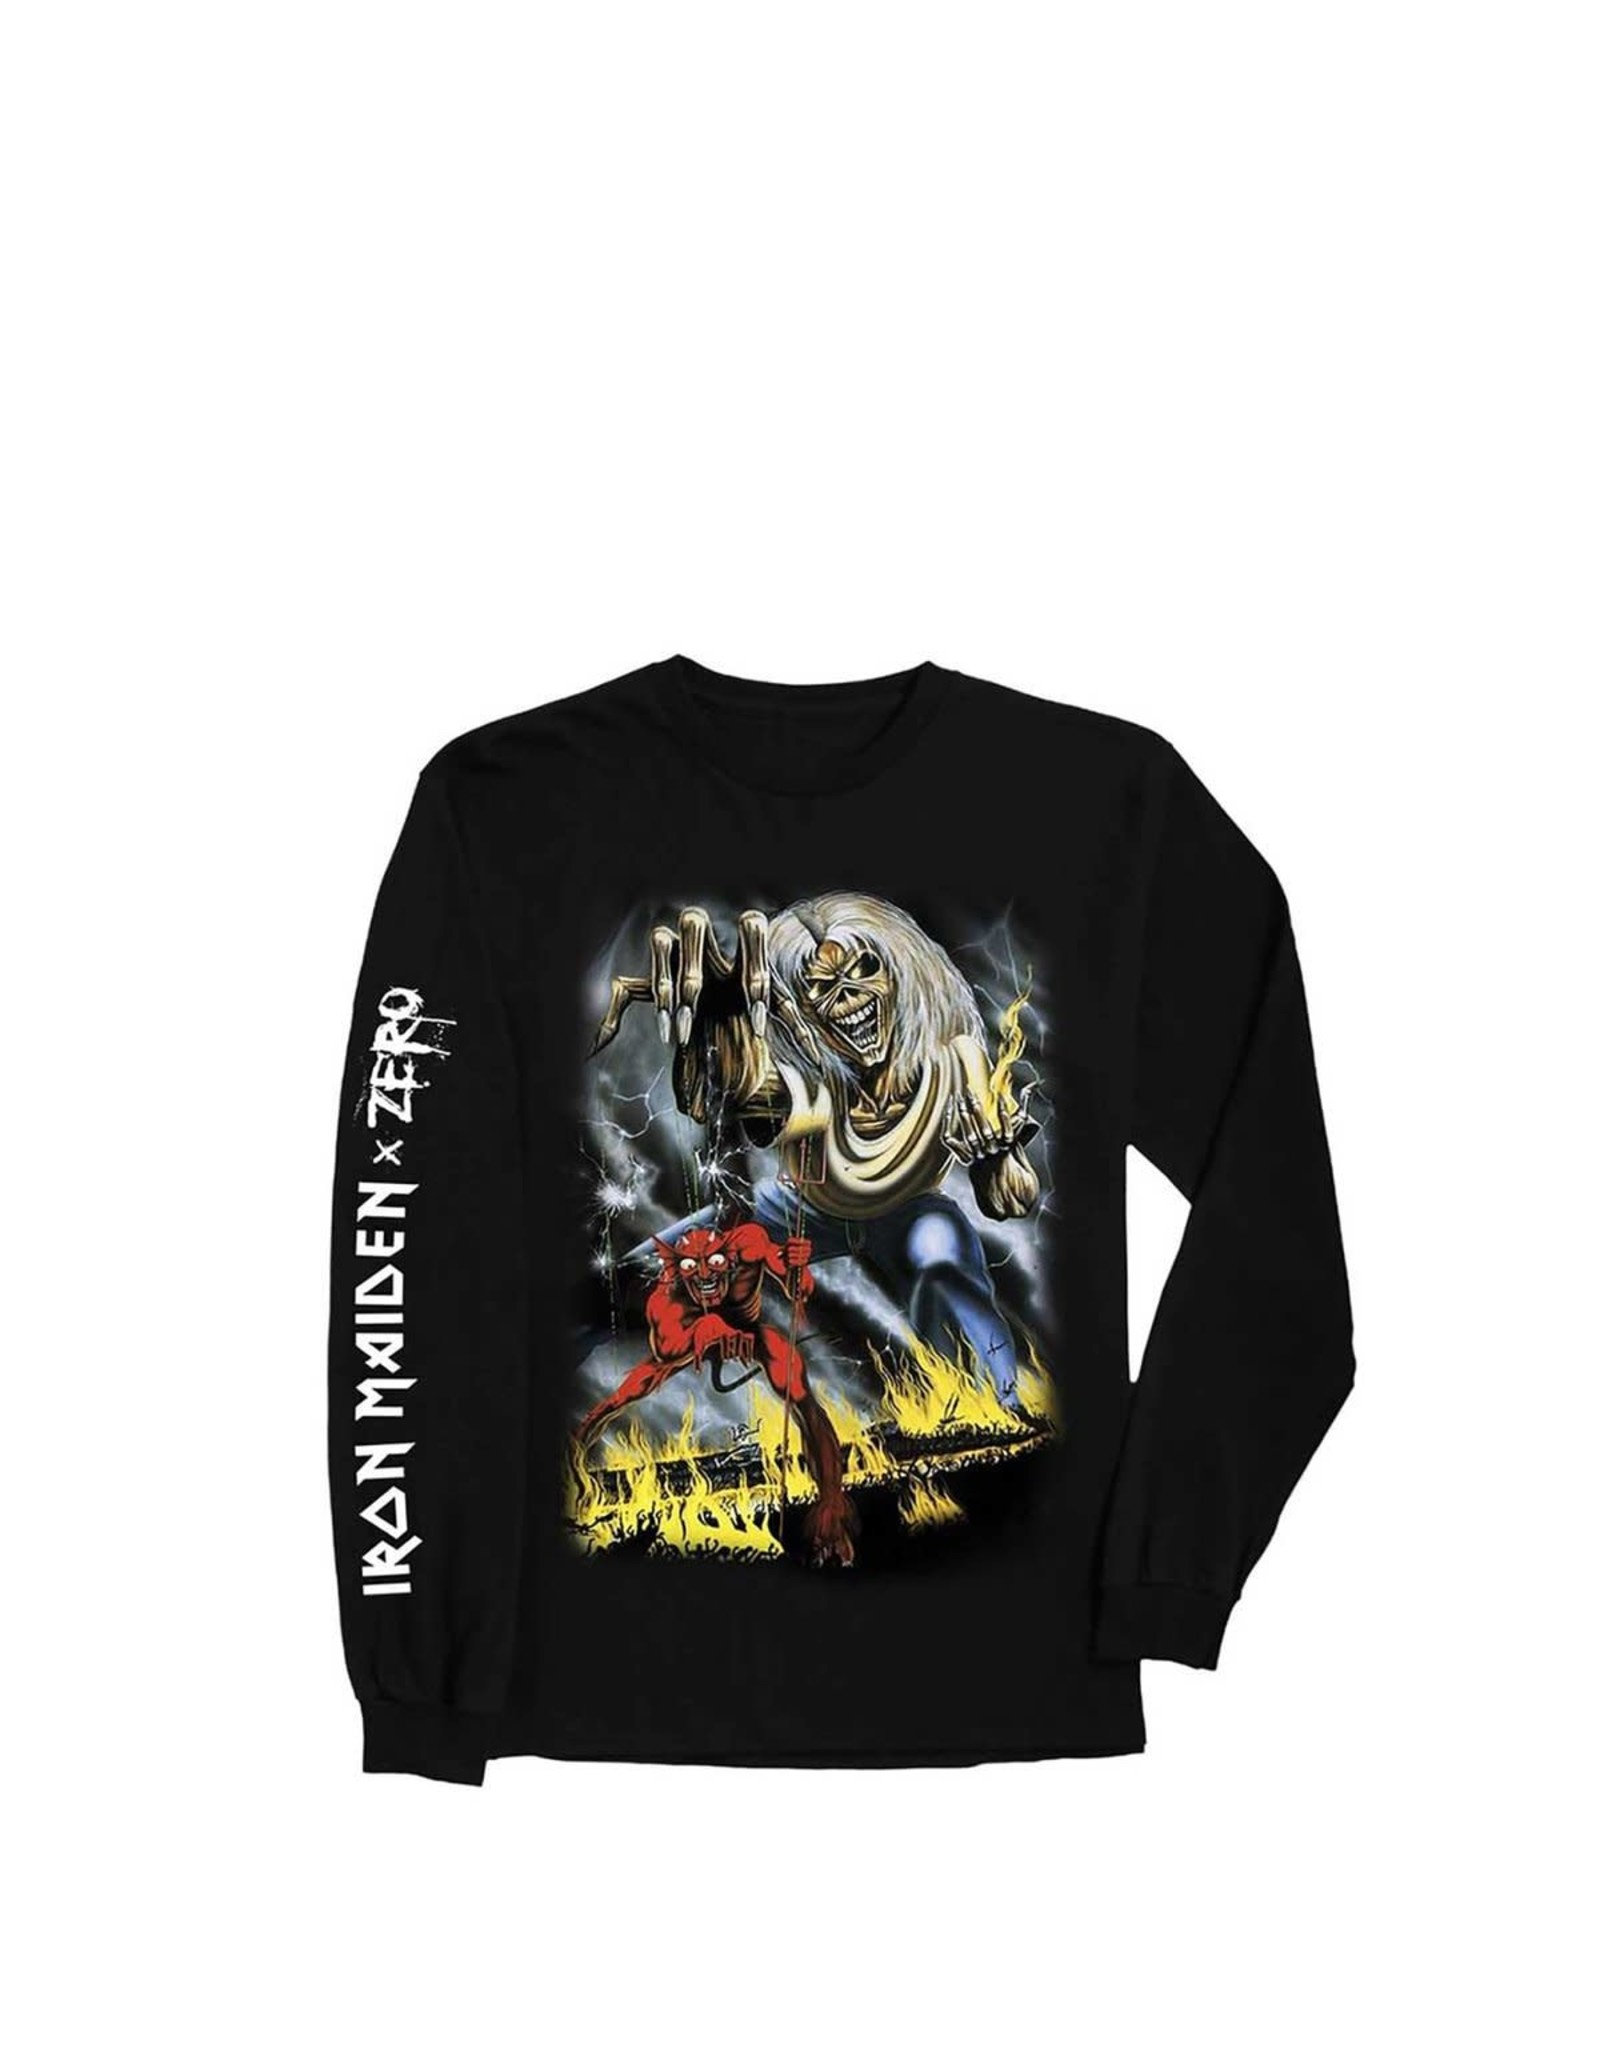 Zero Iron Maiden L/S Tee - Black